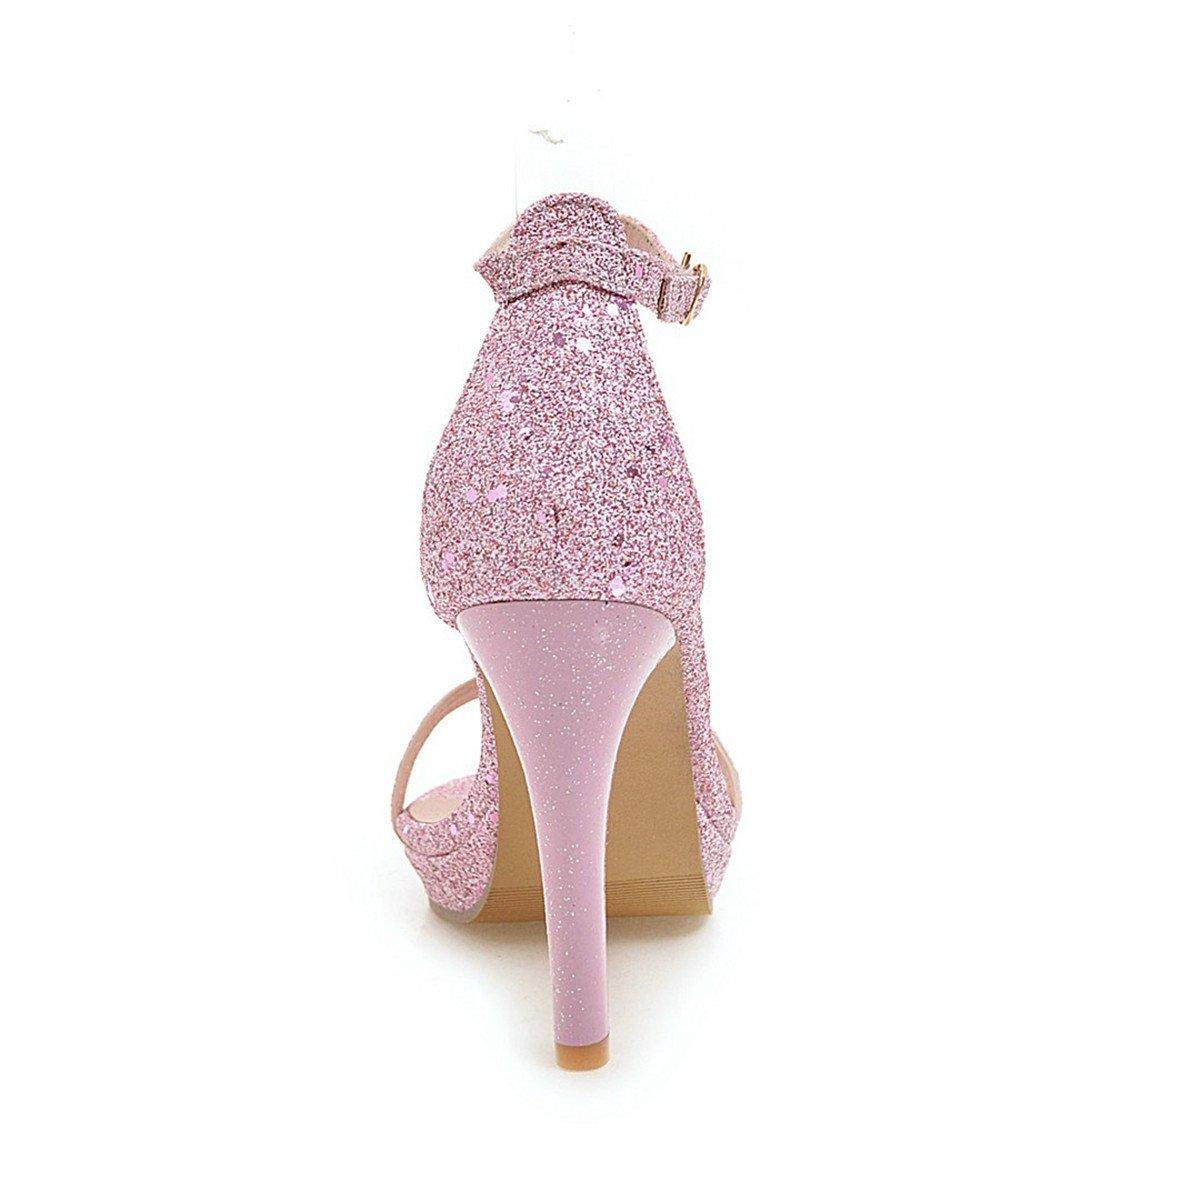 Woherren schuhe Comfort Sandals Walking Walking Walking schuhe   Damen Sandalen   Sandalette Die Vereinigten Staaten und Europa, wasserfeste Sandalen   Frauen groß, hochhackigen Sandalen e29e18